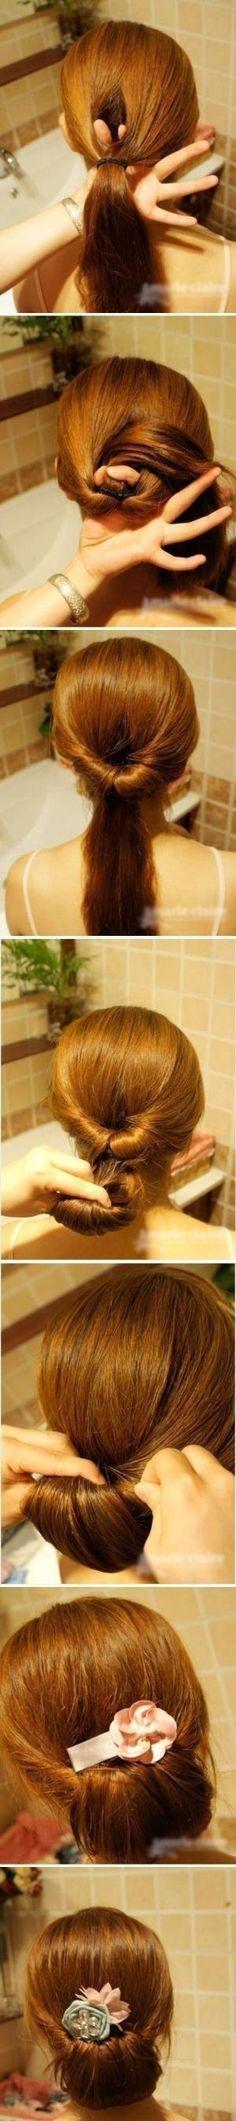 Cool DIY hairstyles for girls by Chelsea Brinker